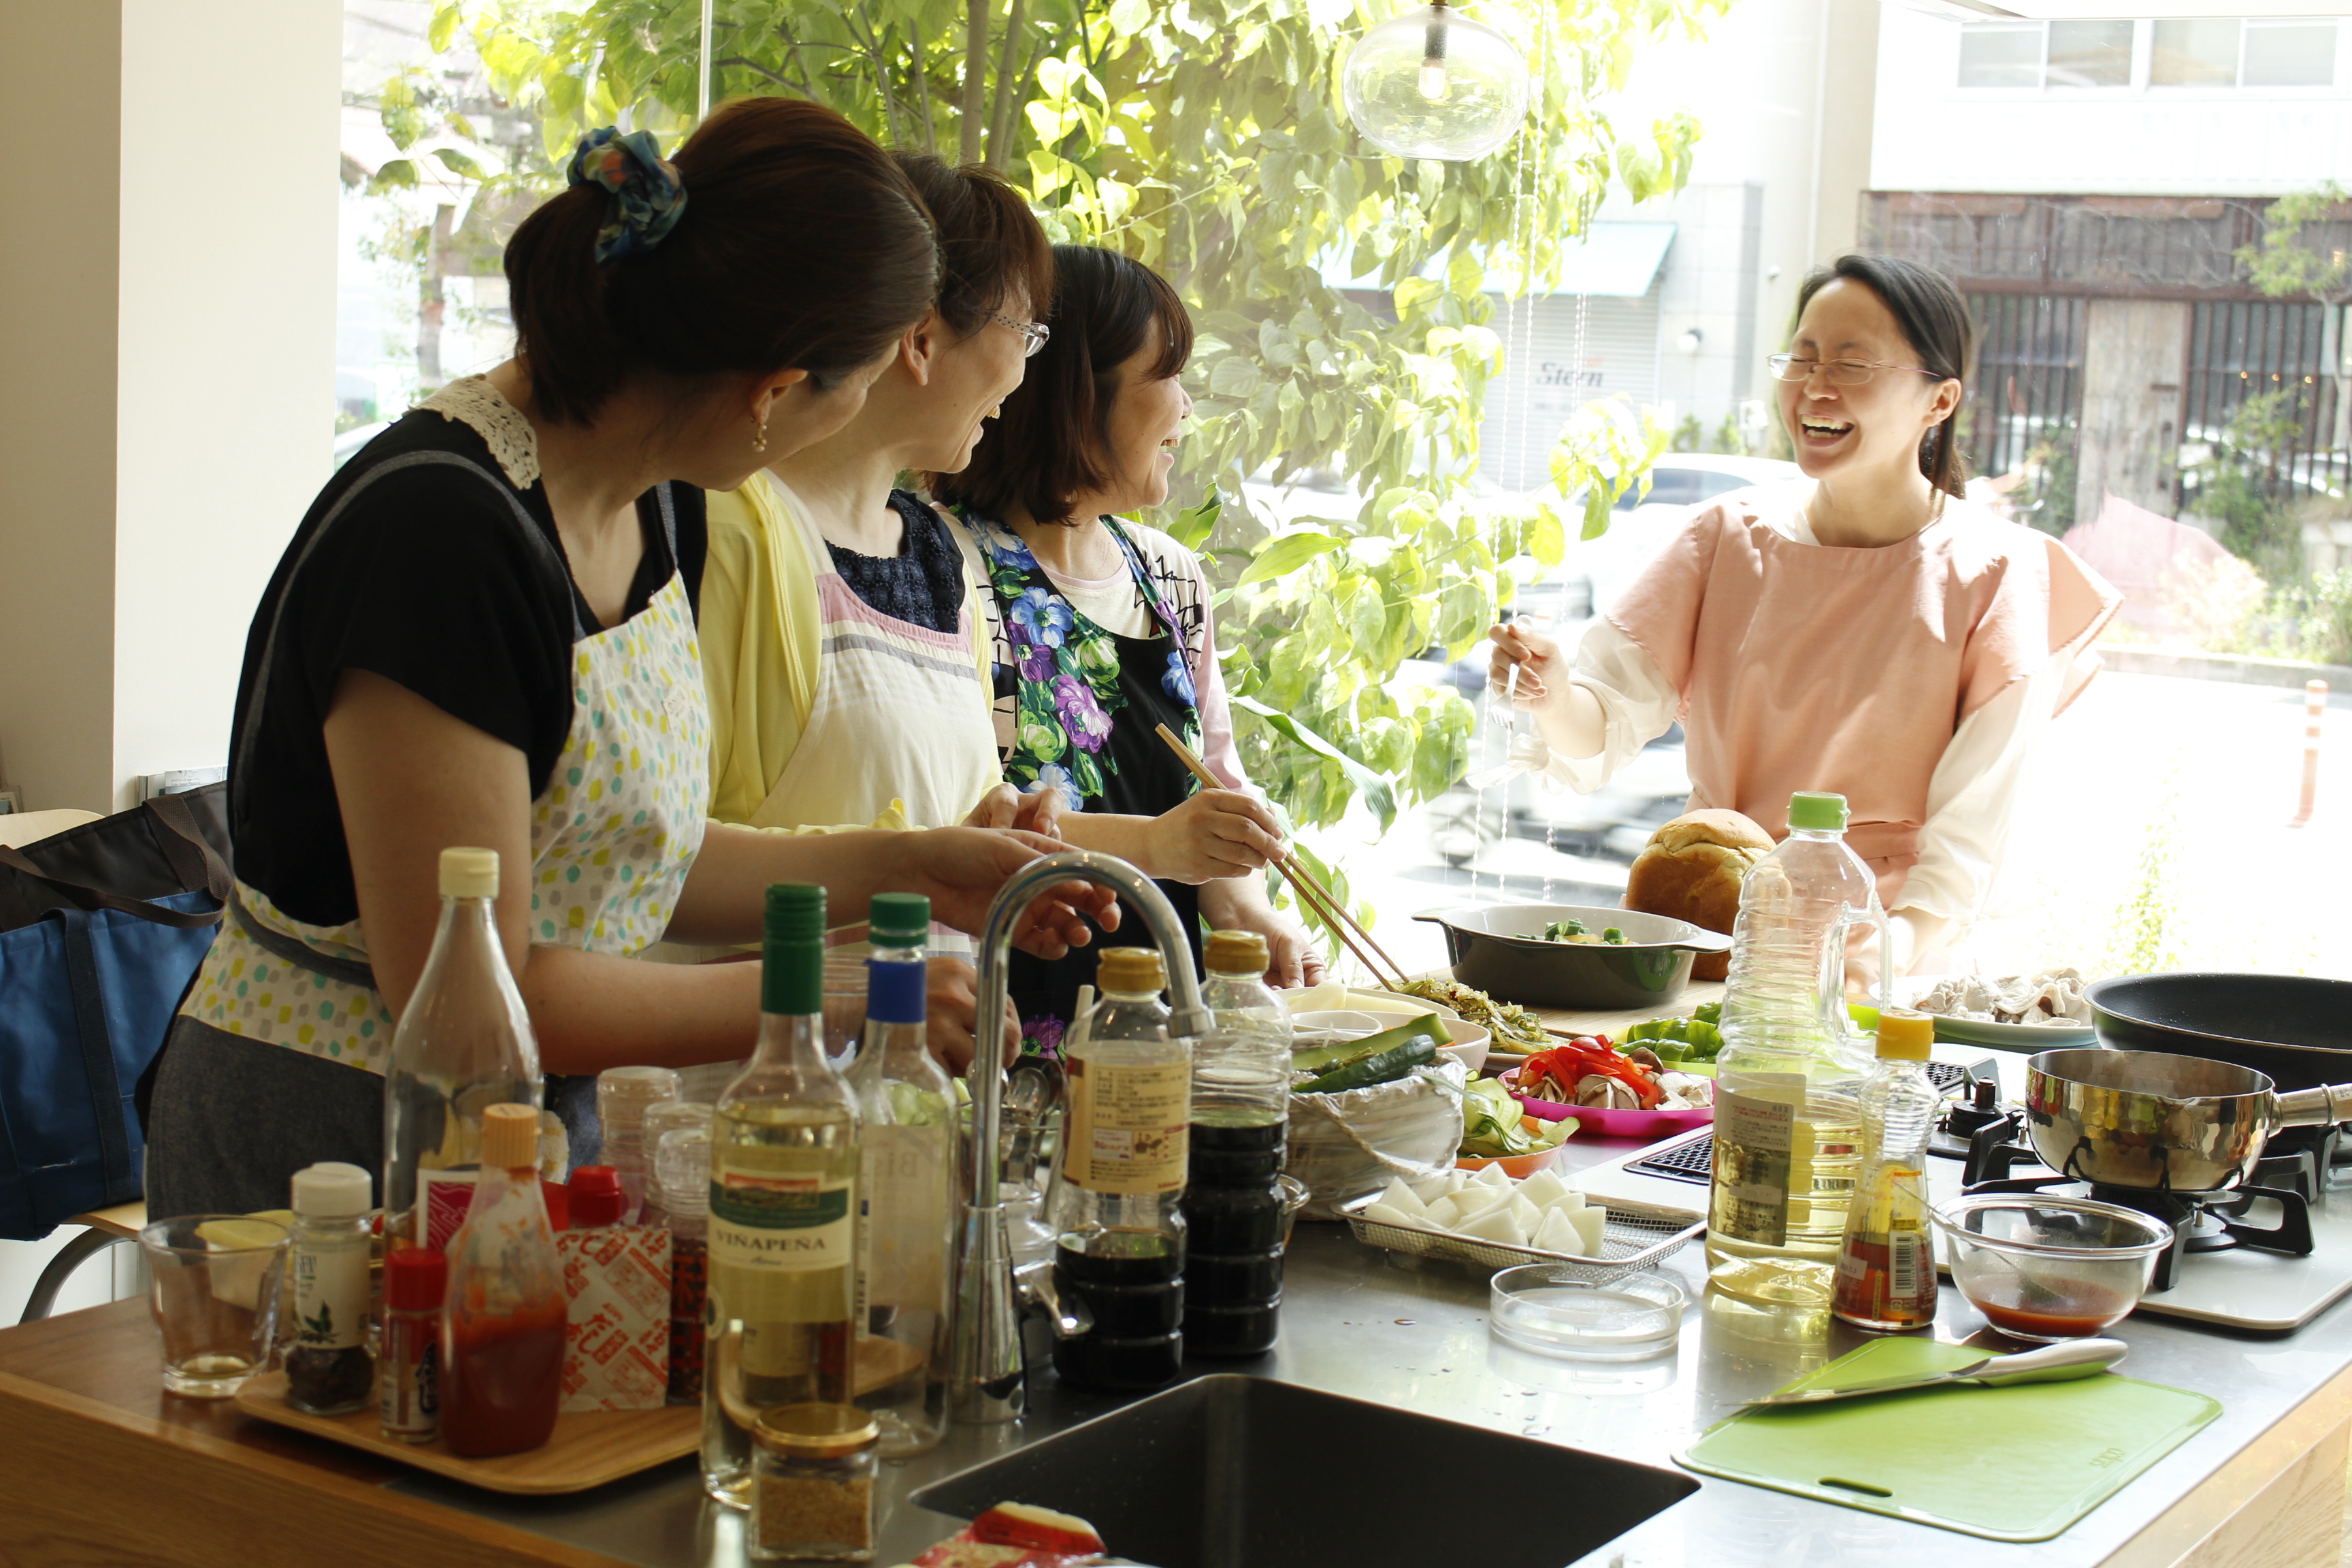 a-ta-sante糖質制限パン料理教室。8月度『糖質制限家庭料理教室』最終日、大盛況で終了。阿倍野区西田辺。